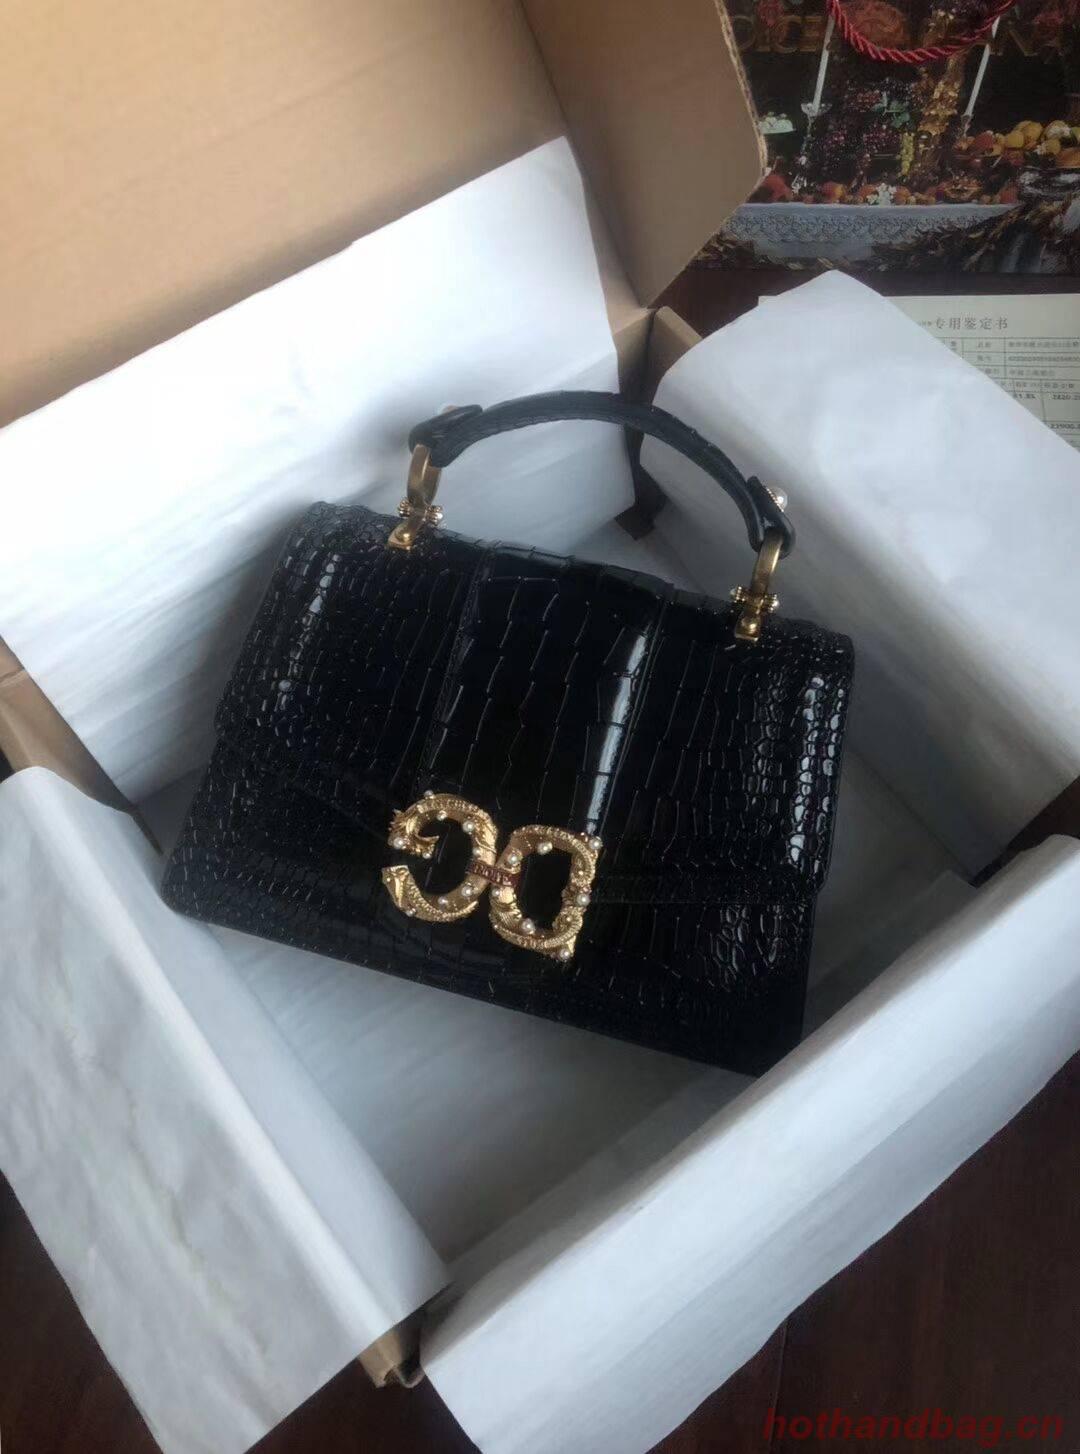 Dolce & Gabbana Origianl Crocodile Leather Bag 4916E Black